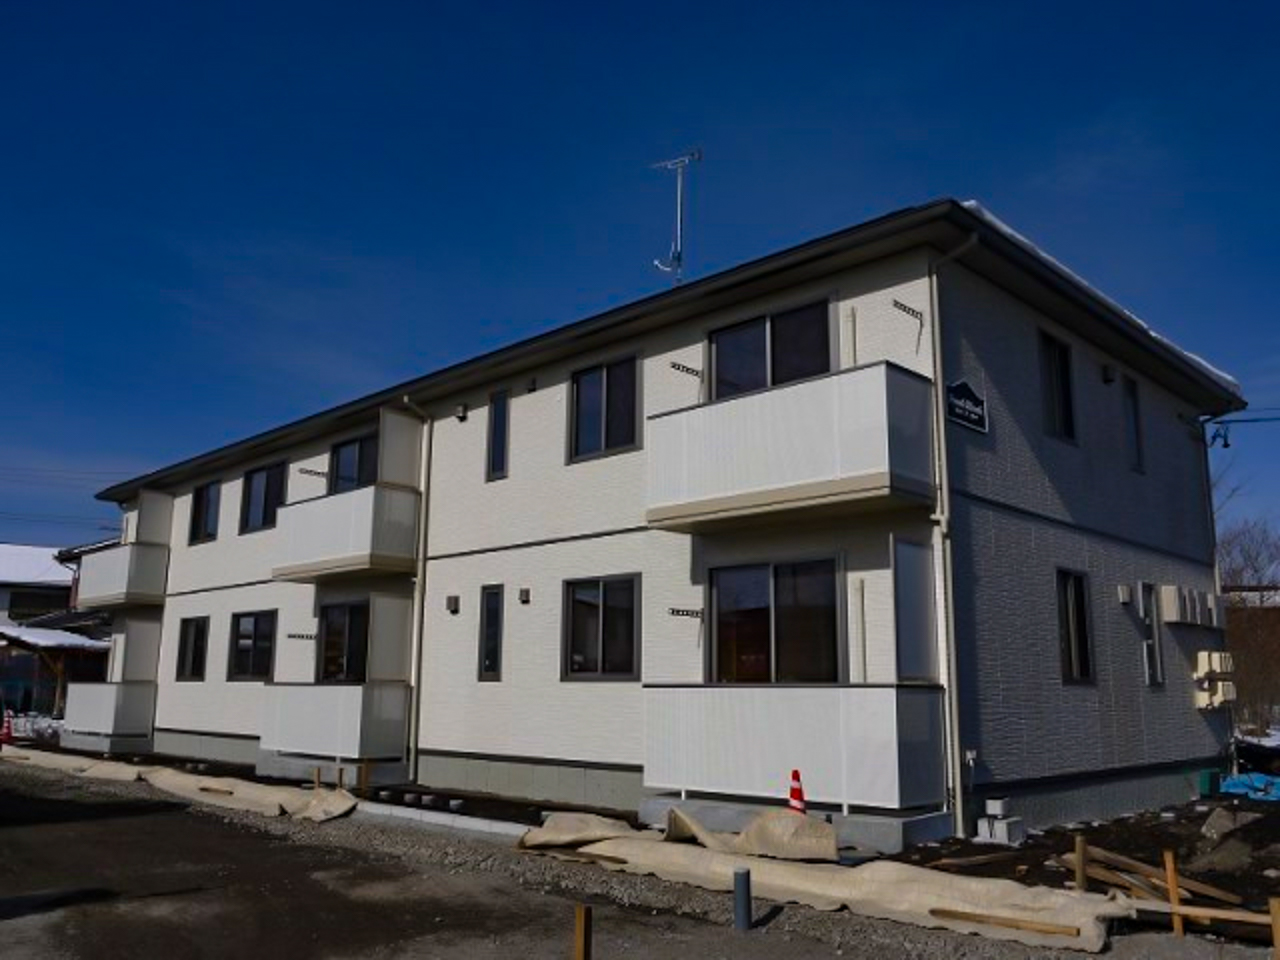 68000 yen/month, 2 bedroom Apartment, Naka Karuizawa, PRO NUBE MARK